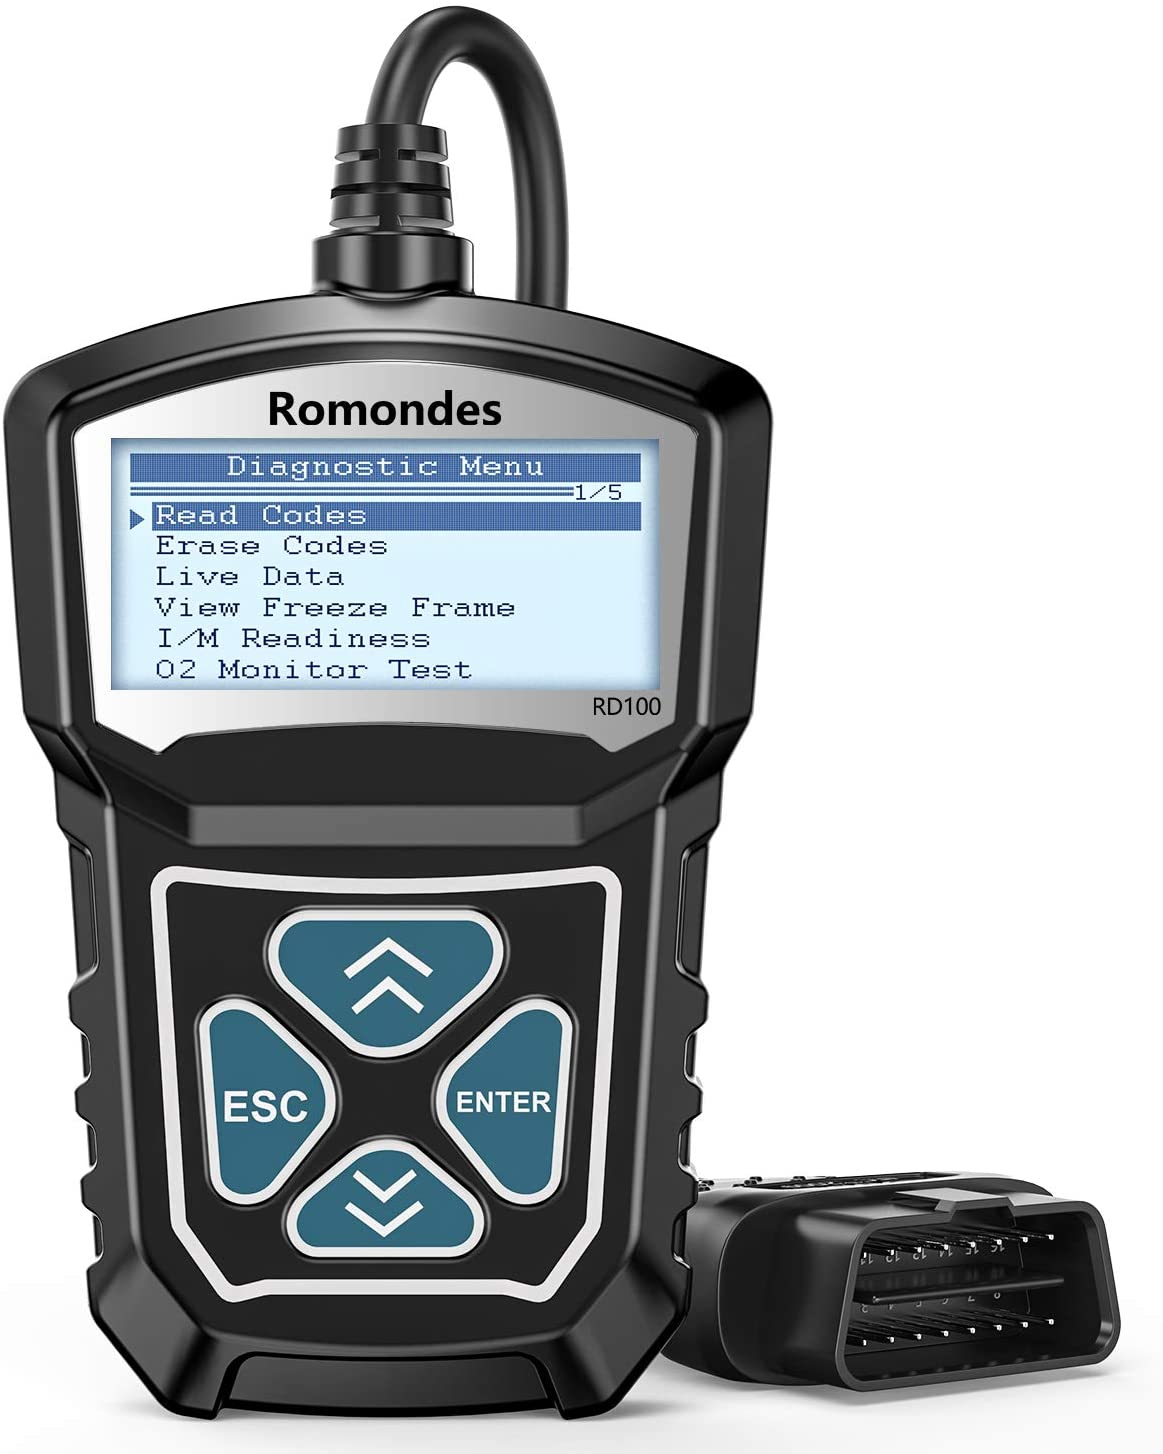 Romondes RD100 Car Scanner